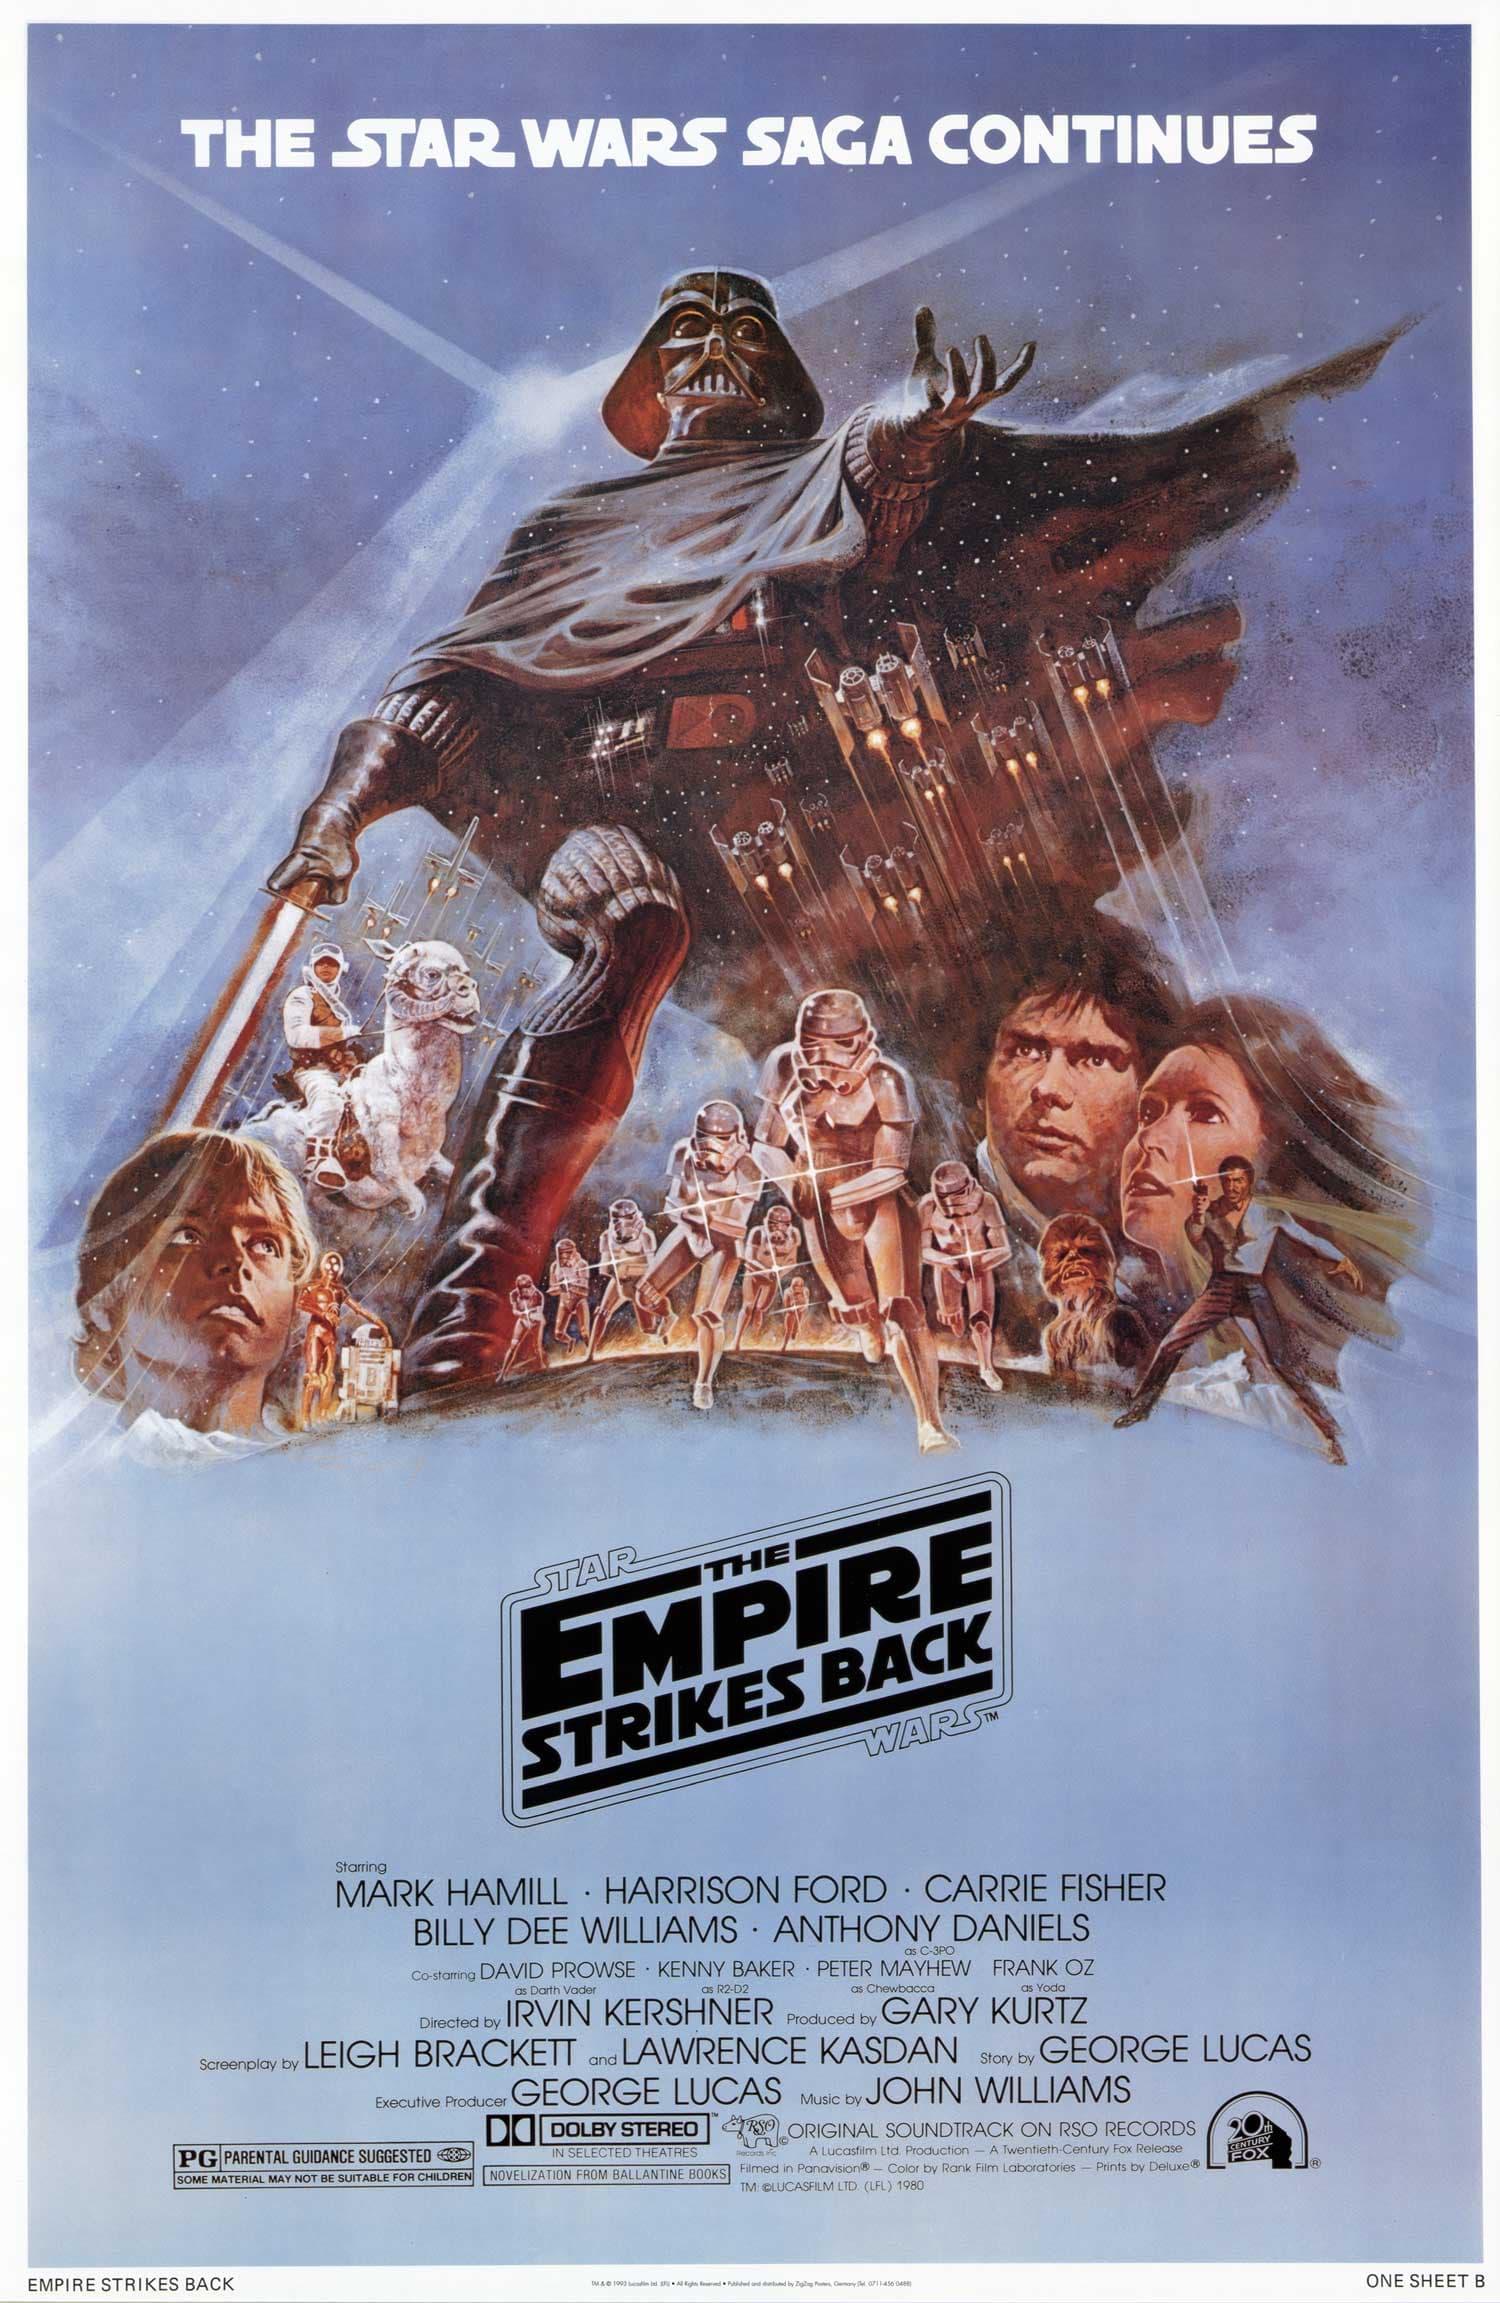 Random Greatest Sci-Fi Movies